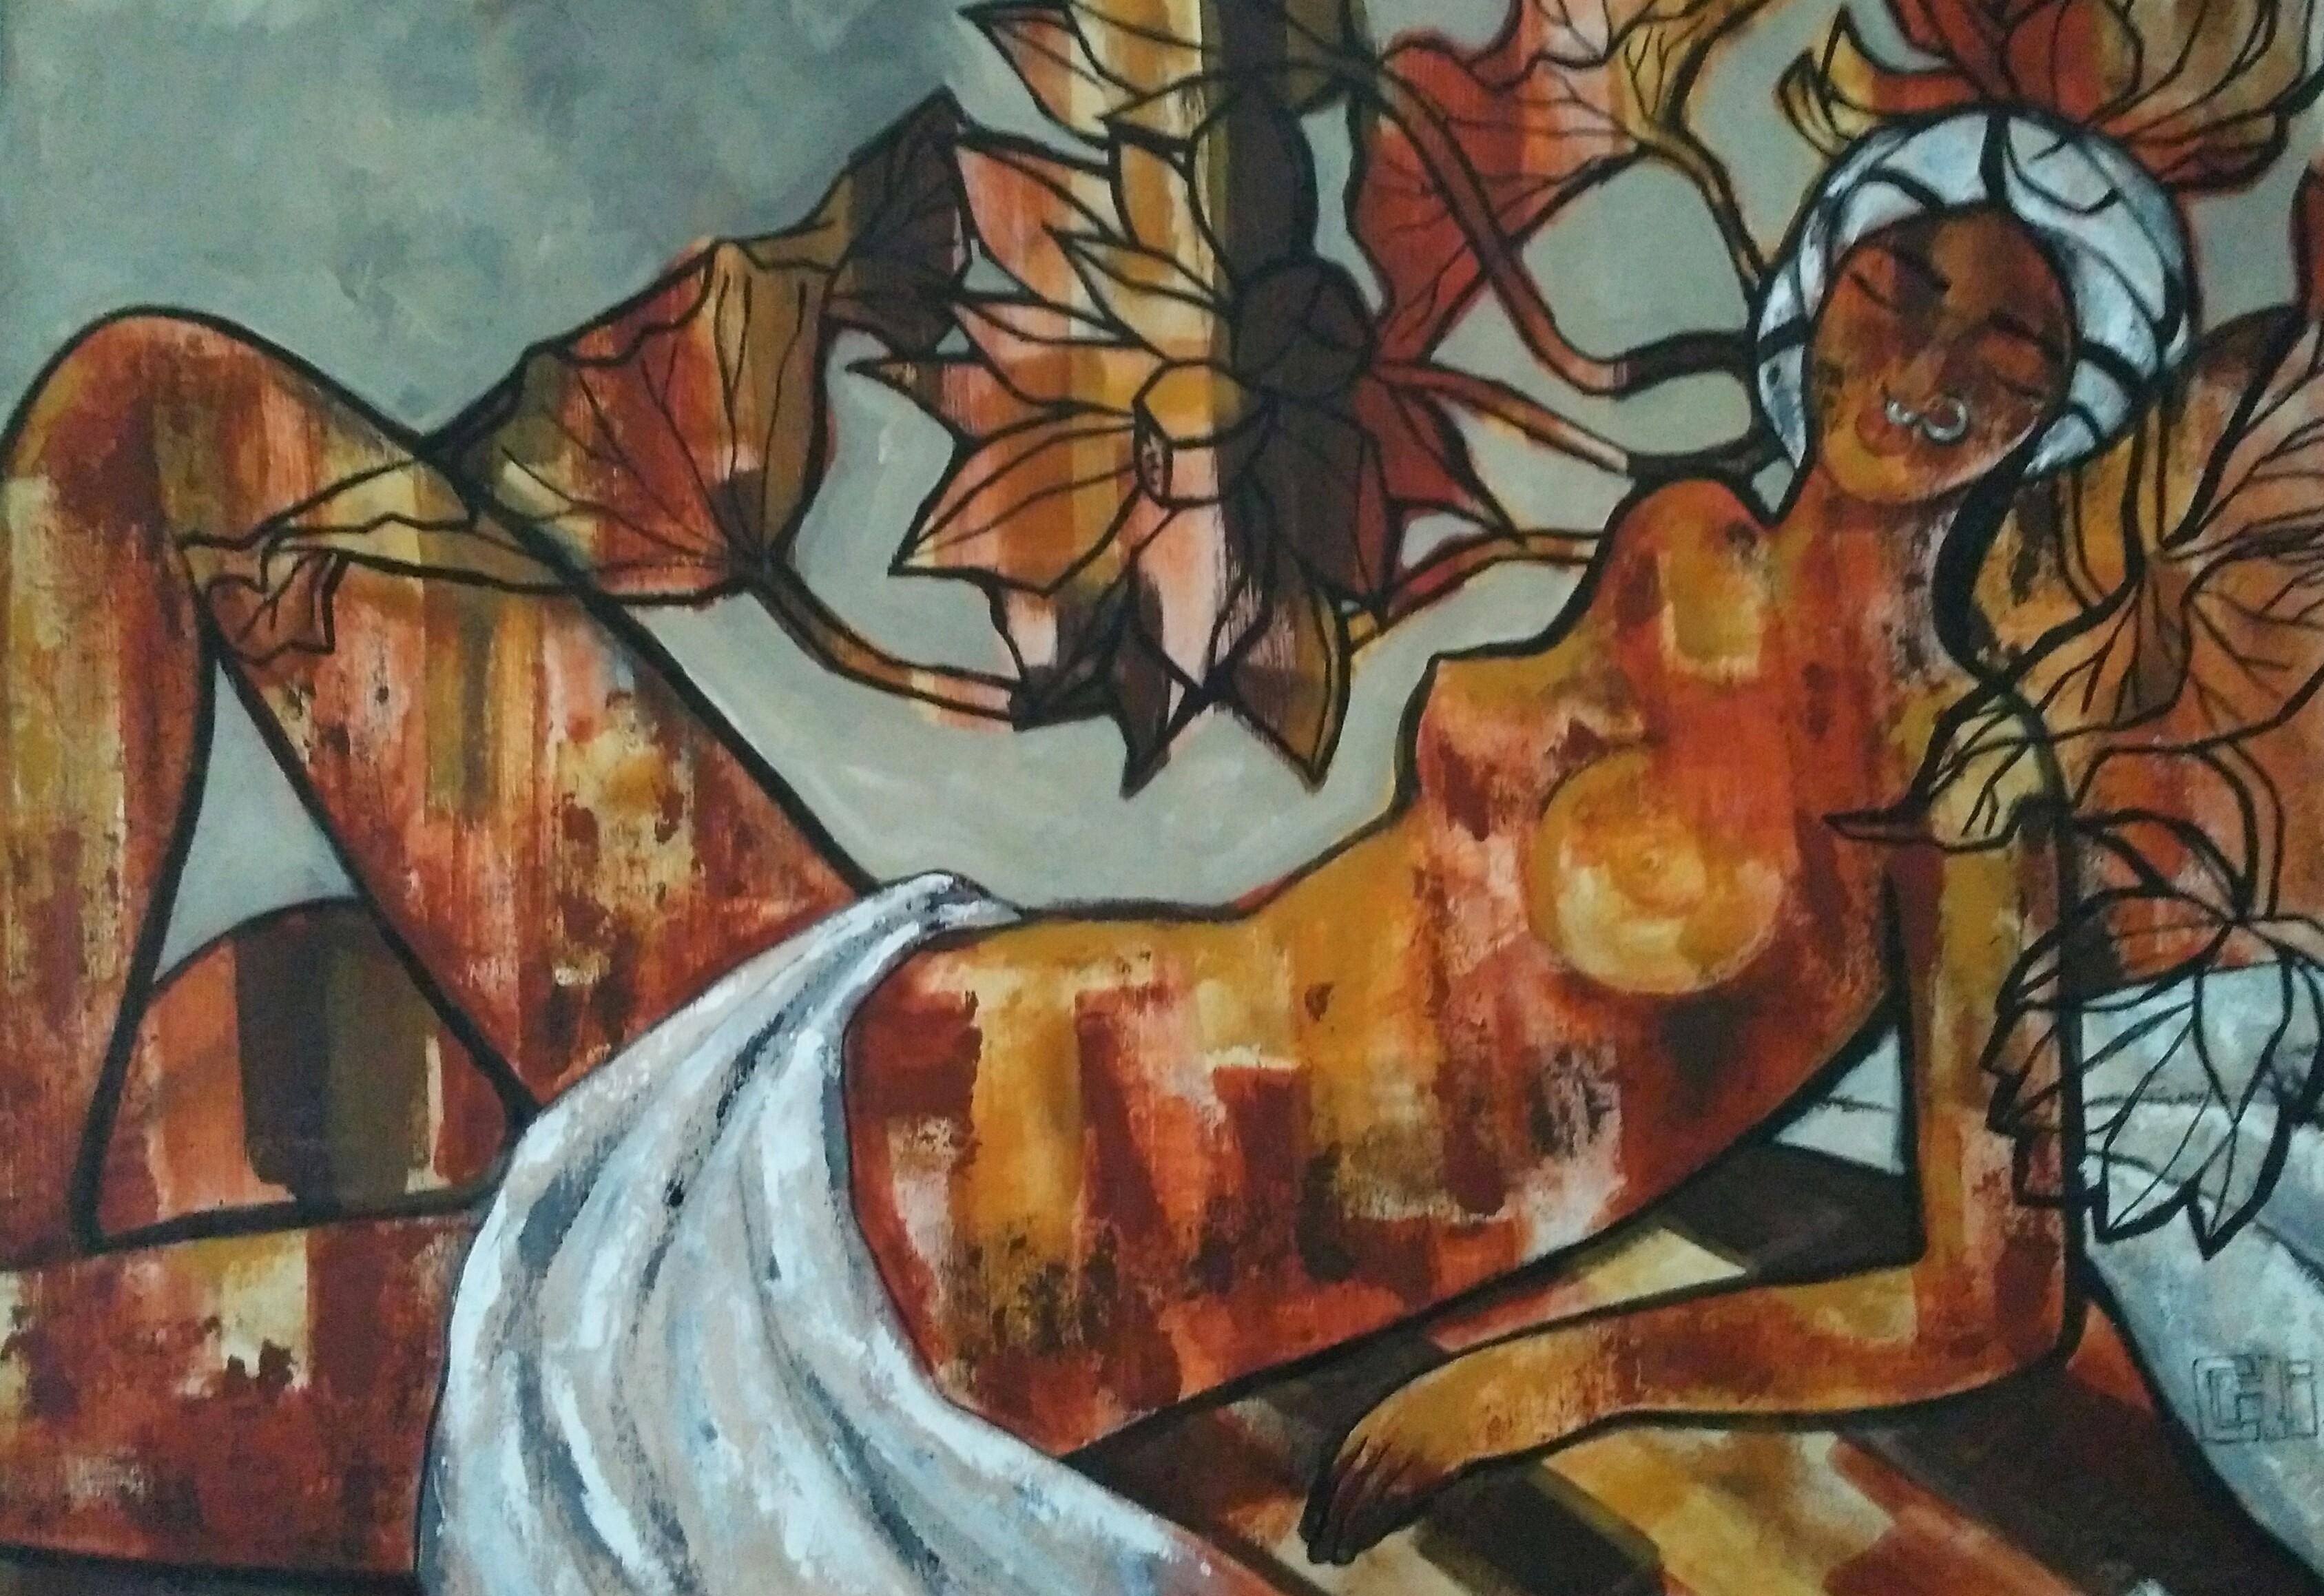 reclining figure II 24x36 acrylics on canvas 85,000